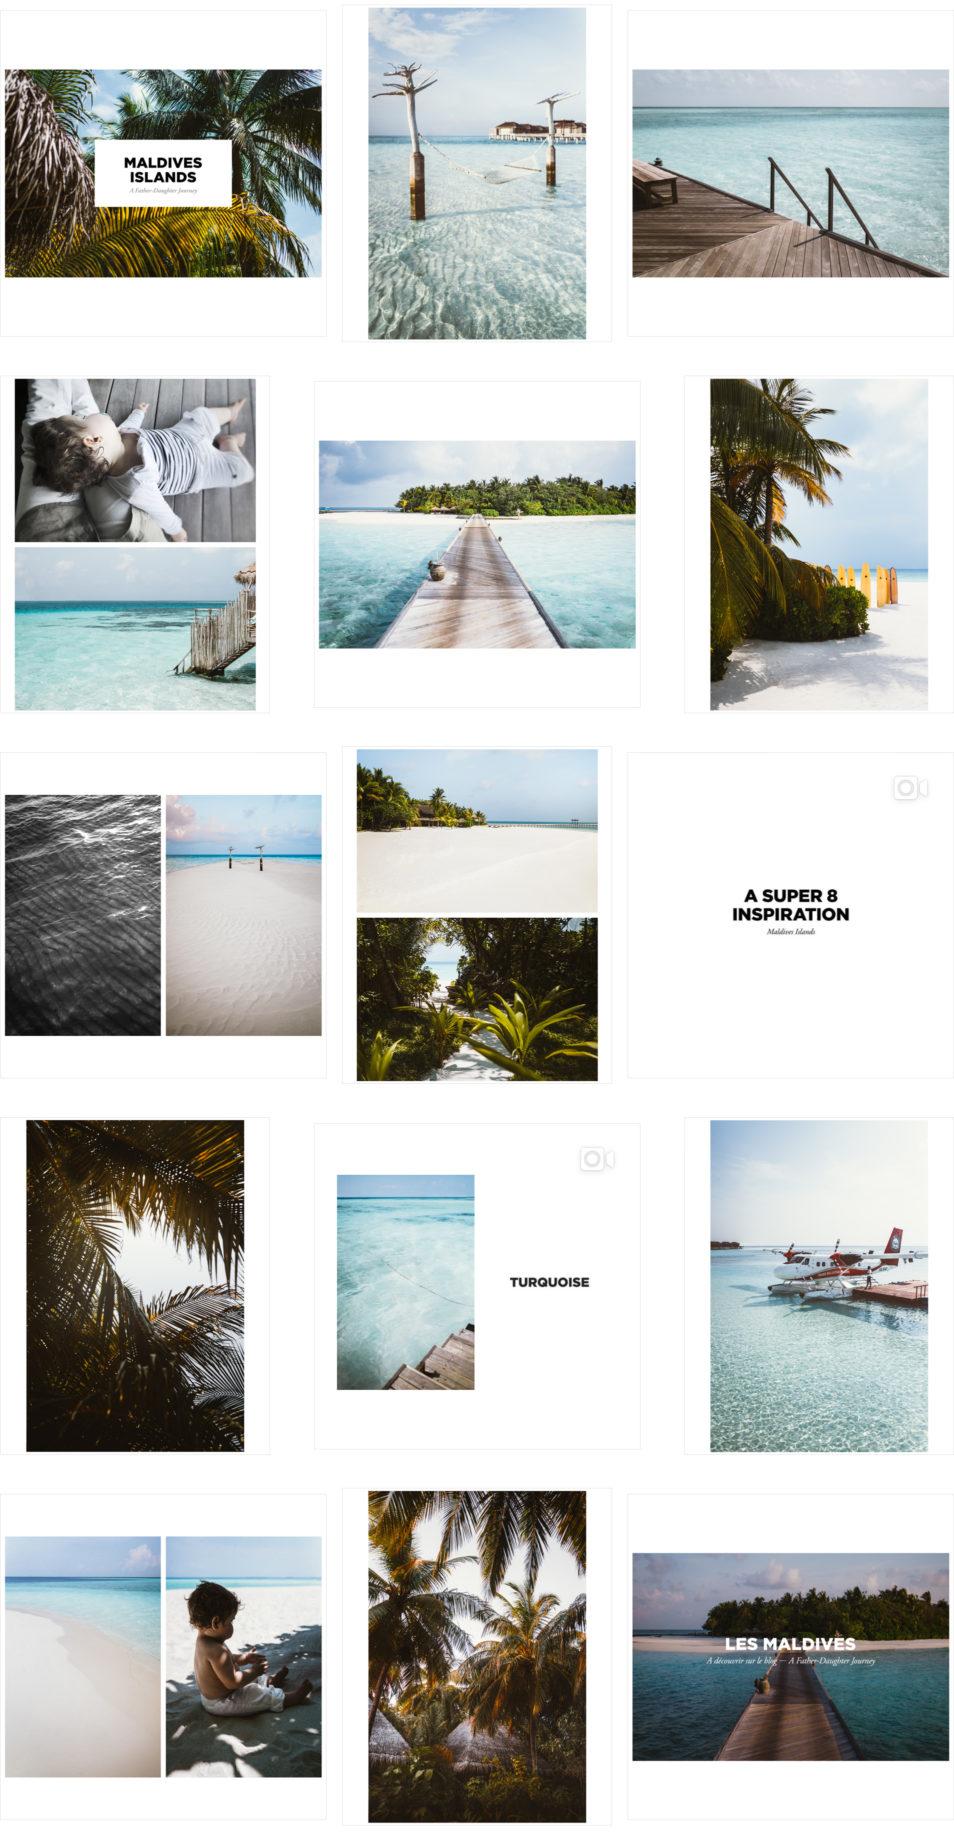 Voyager aux Maldives Blog Voyage Inspiration